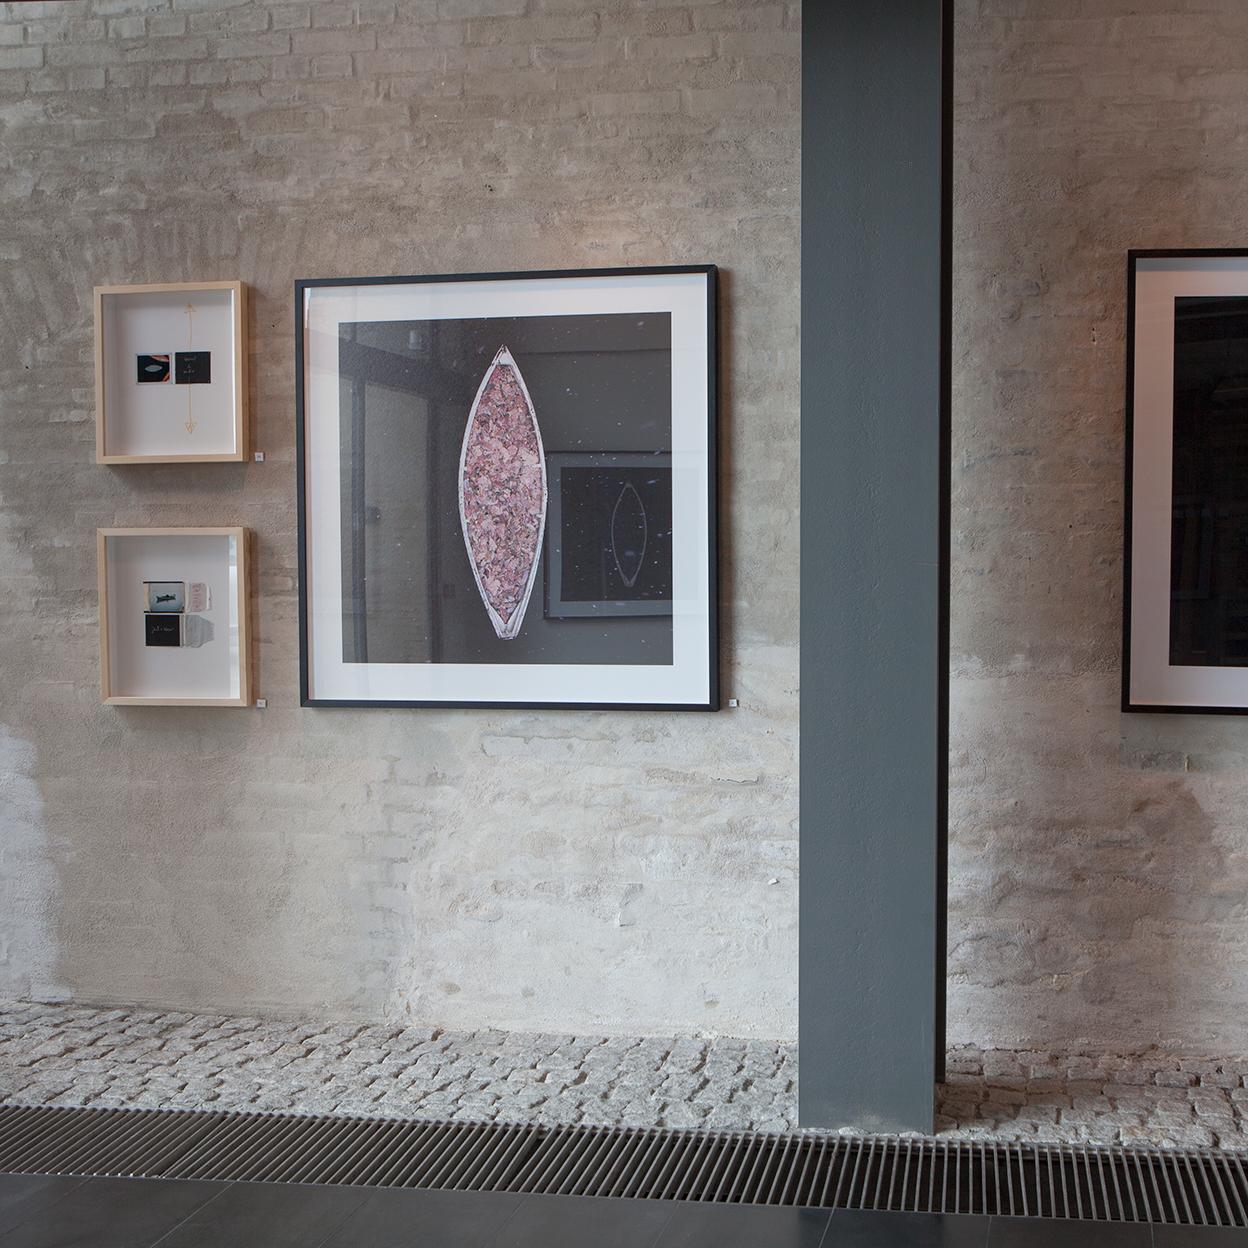 exhibition_10km-to-shore_8_hpalmason.jpg